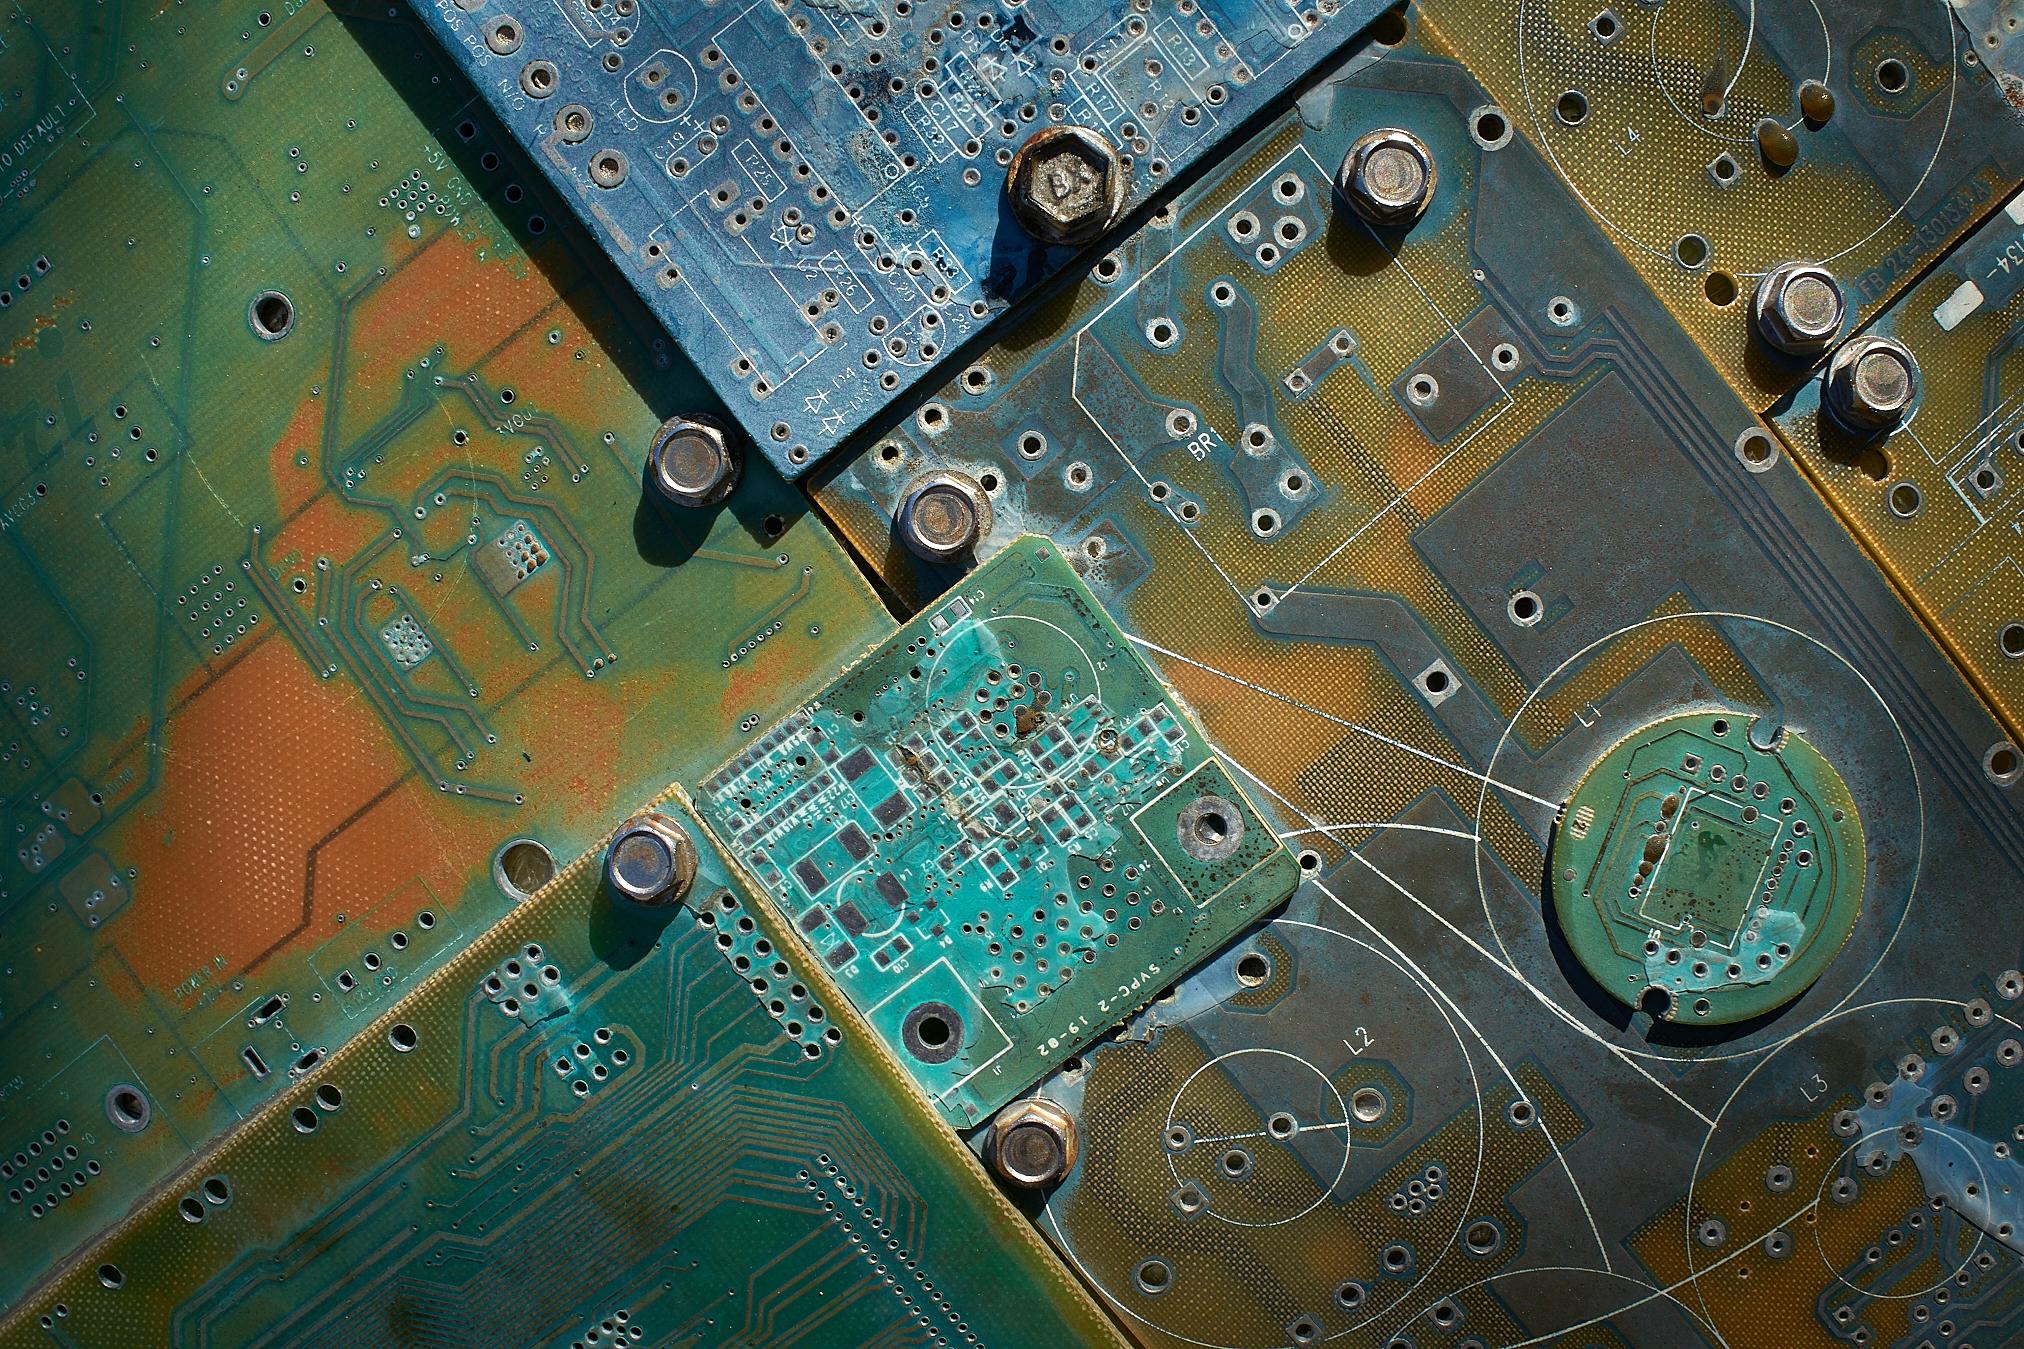 Circuit Boards by Peter Adams.